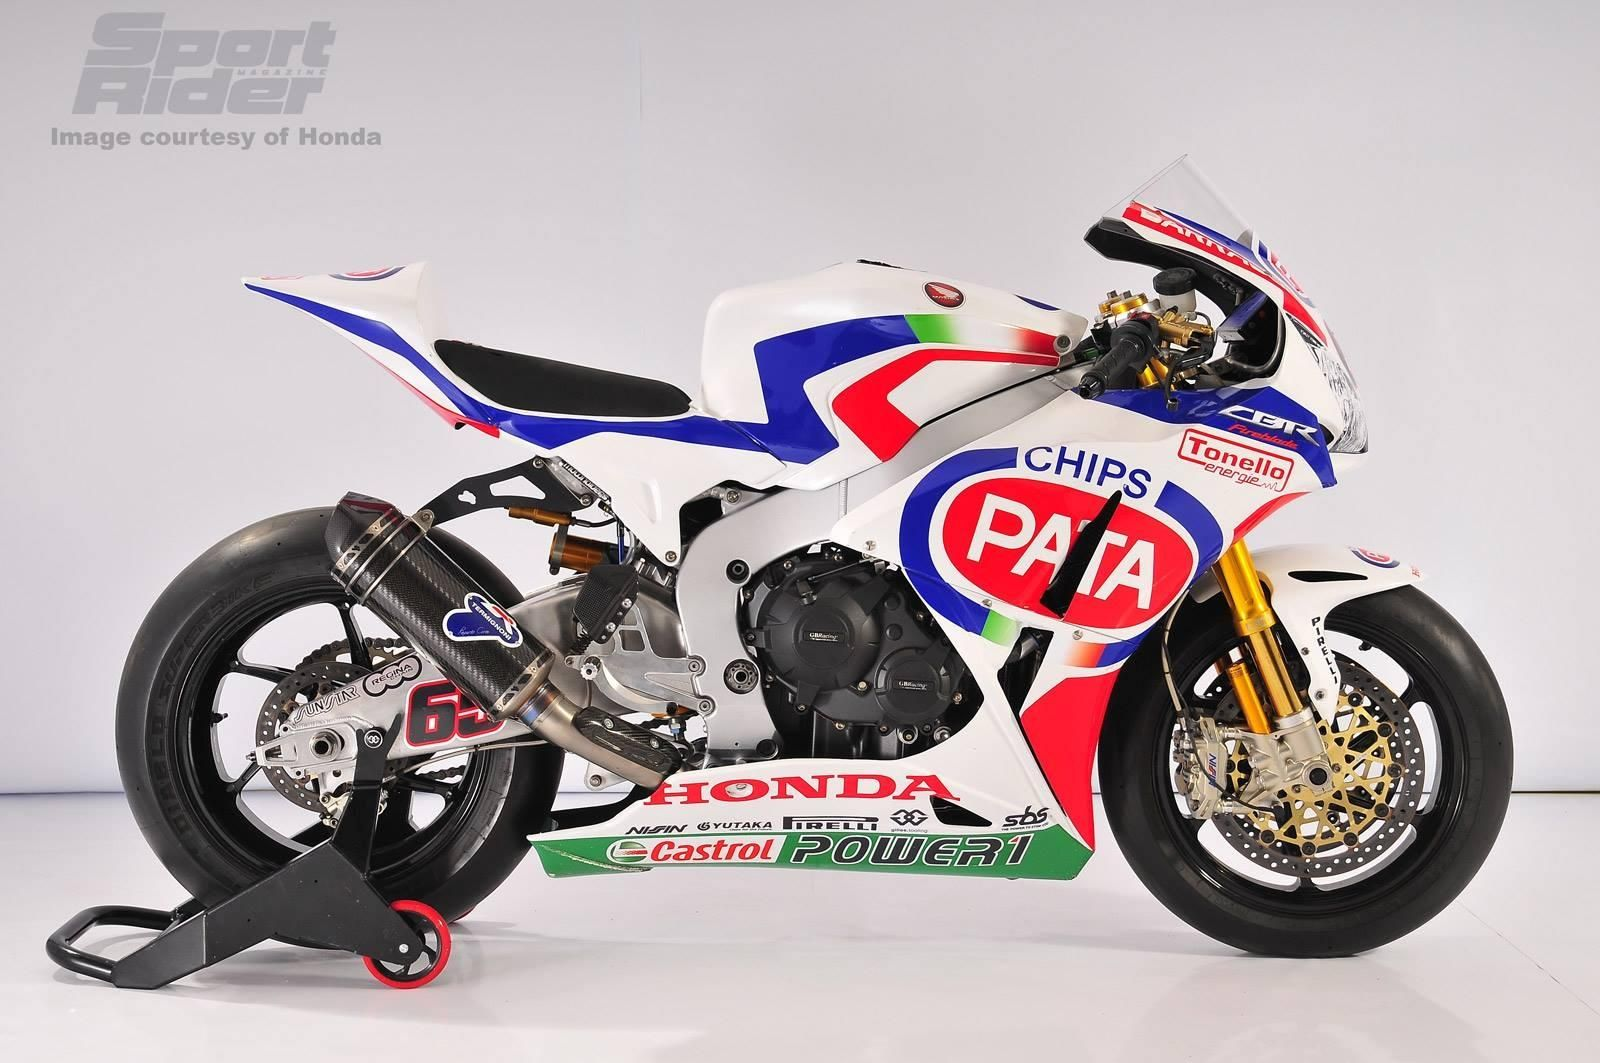 Picture Of A 2014 Honda Cbr1000rr Sportbike Id 612565 In 2020 Honda Super Bikes Racing Bikes